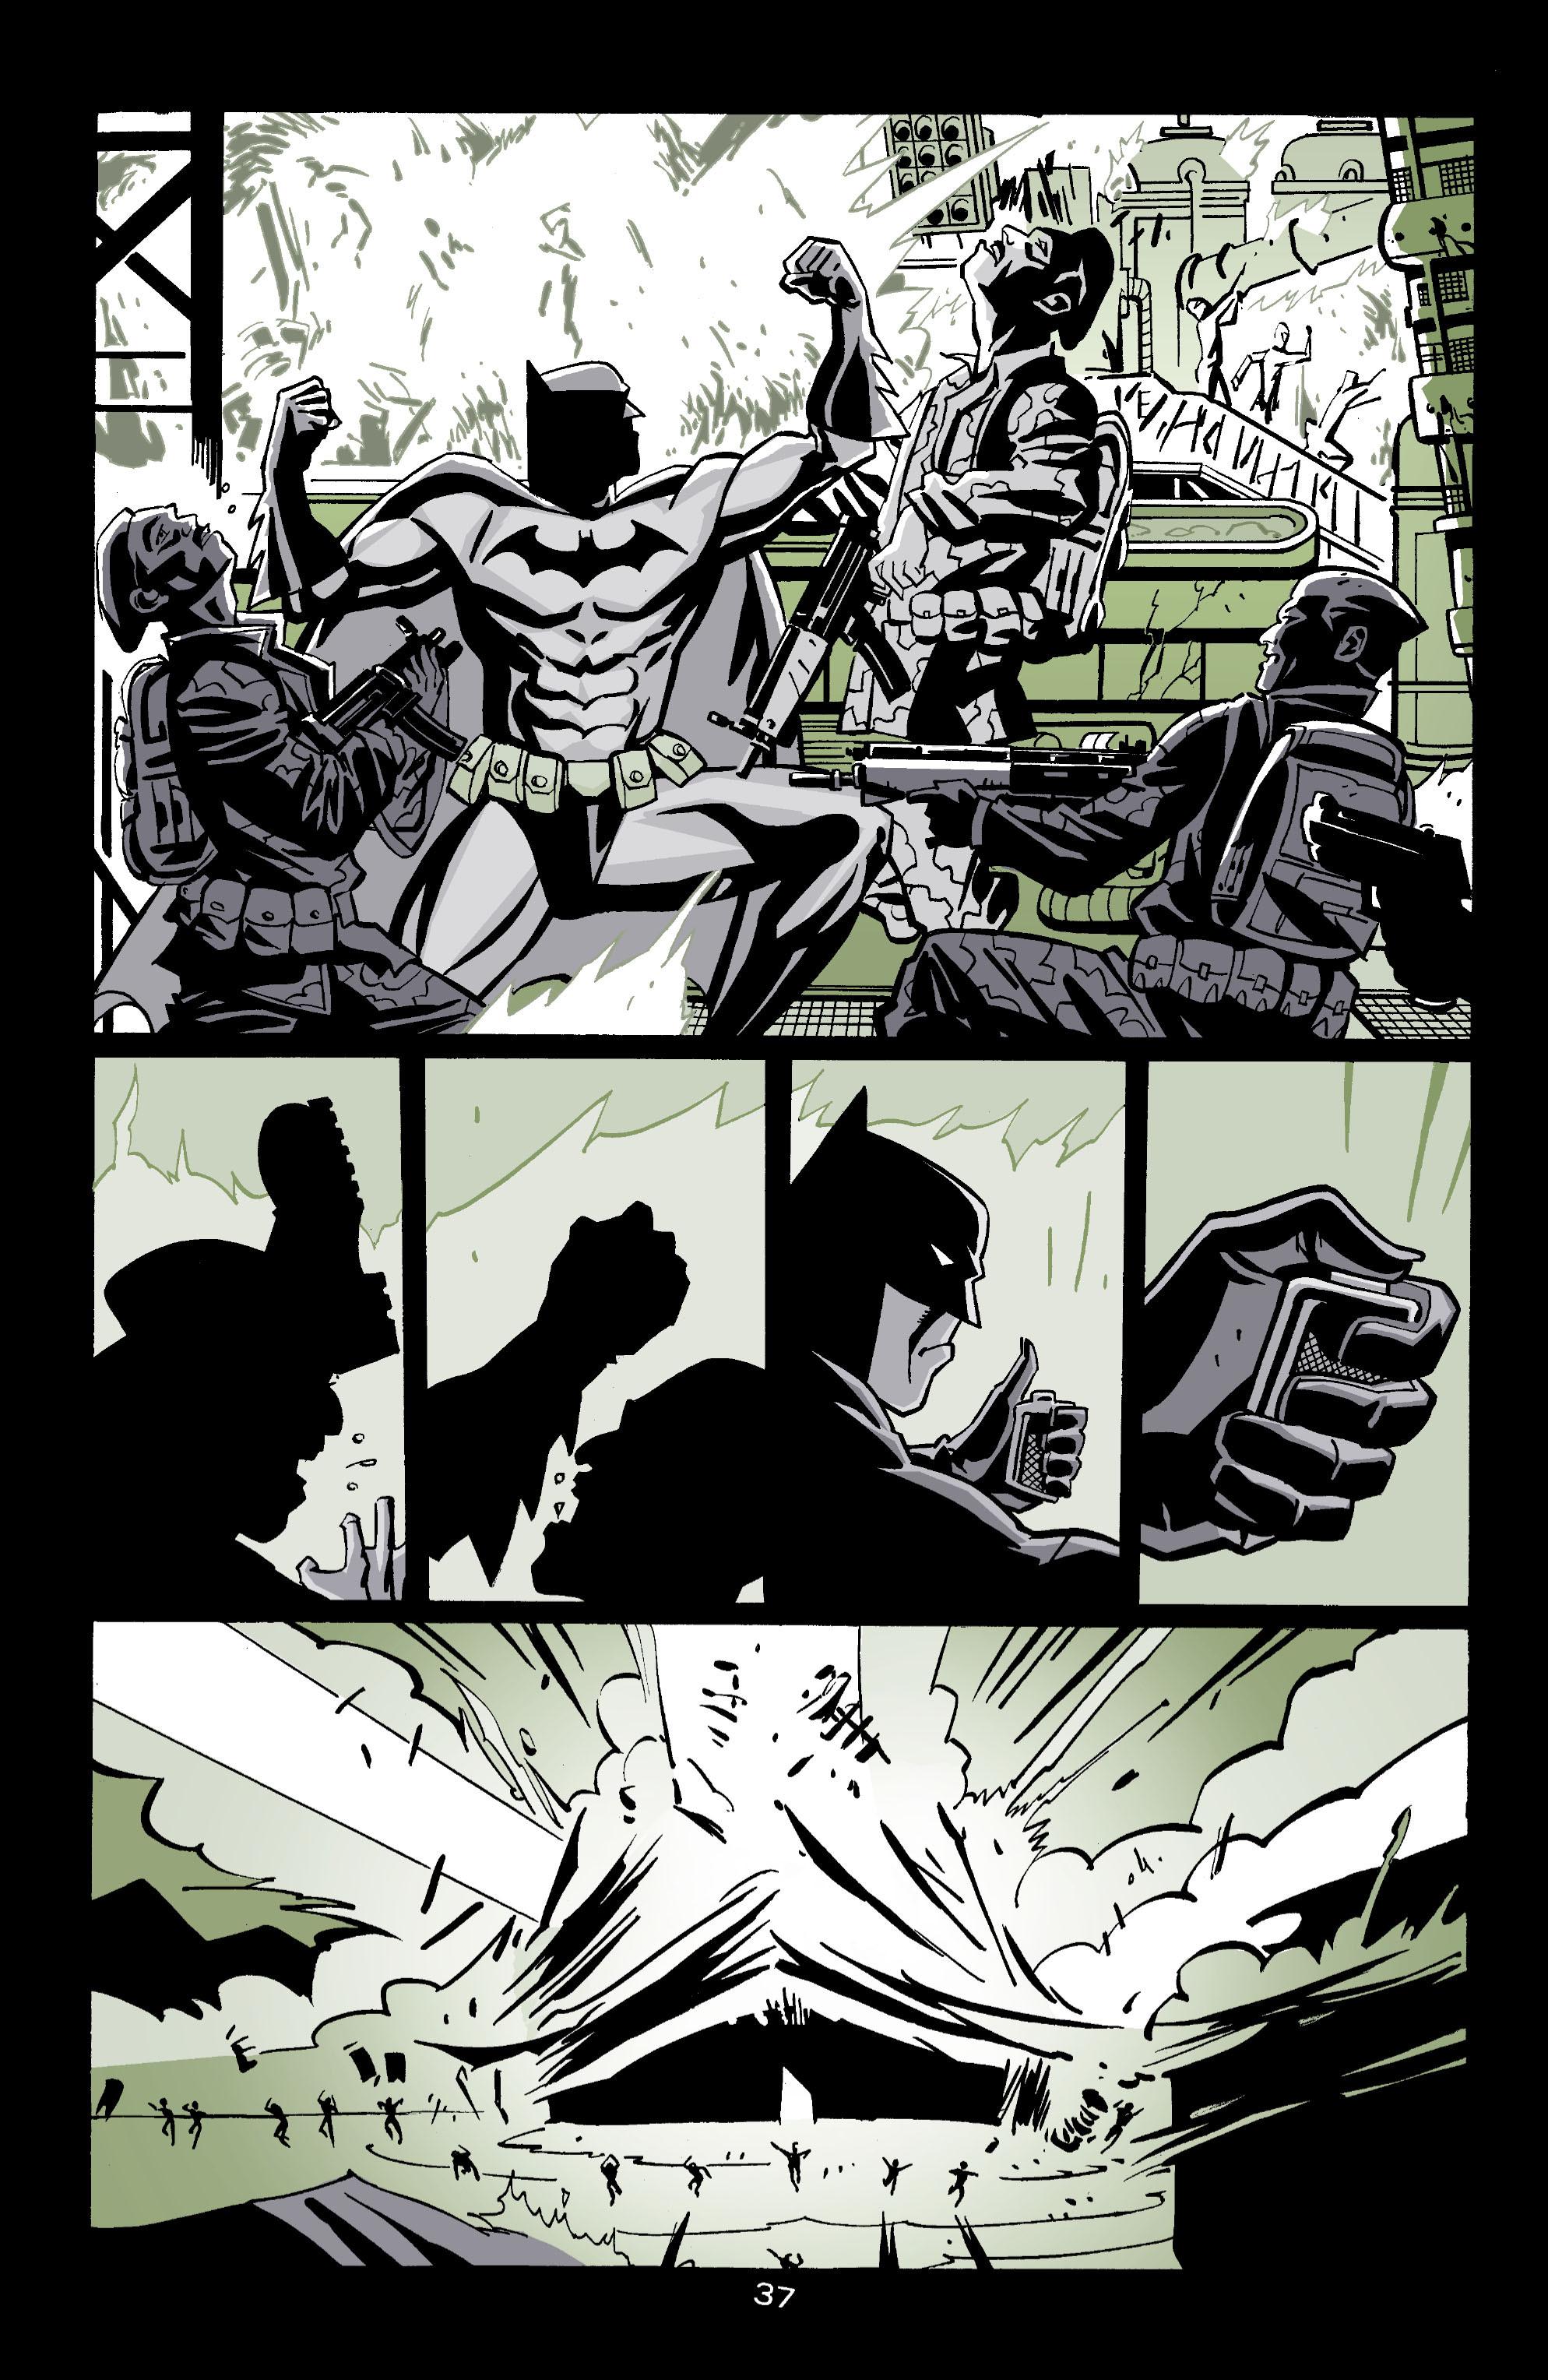 Detective Comics (1937) 750 Page 37